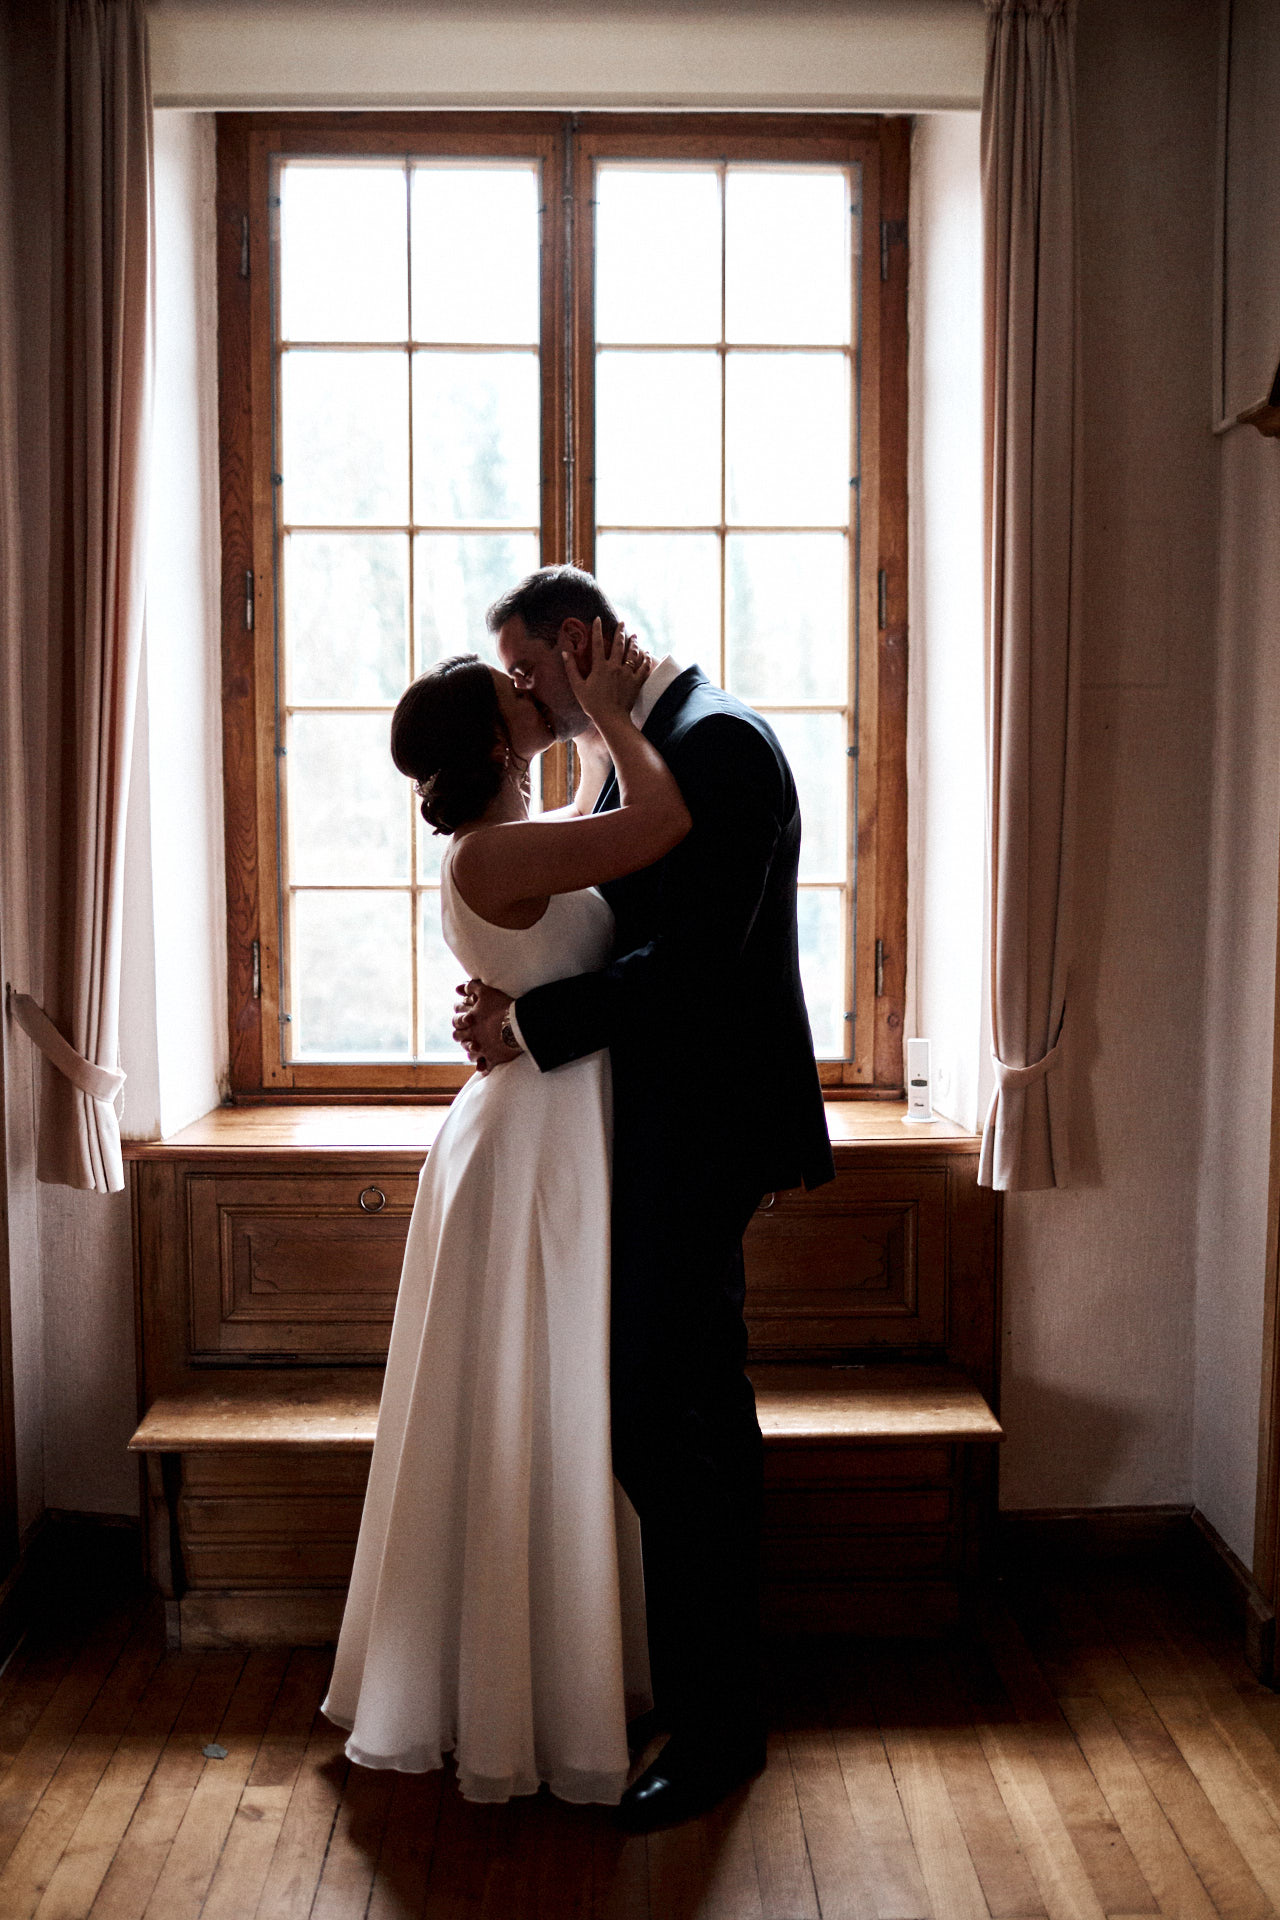 2019-12-20 Laura & Robin - Alena and Daniel Weddings 0222